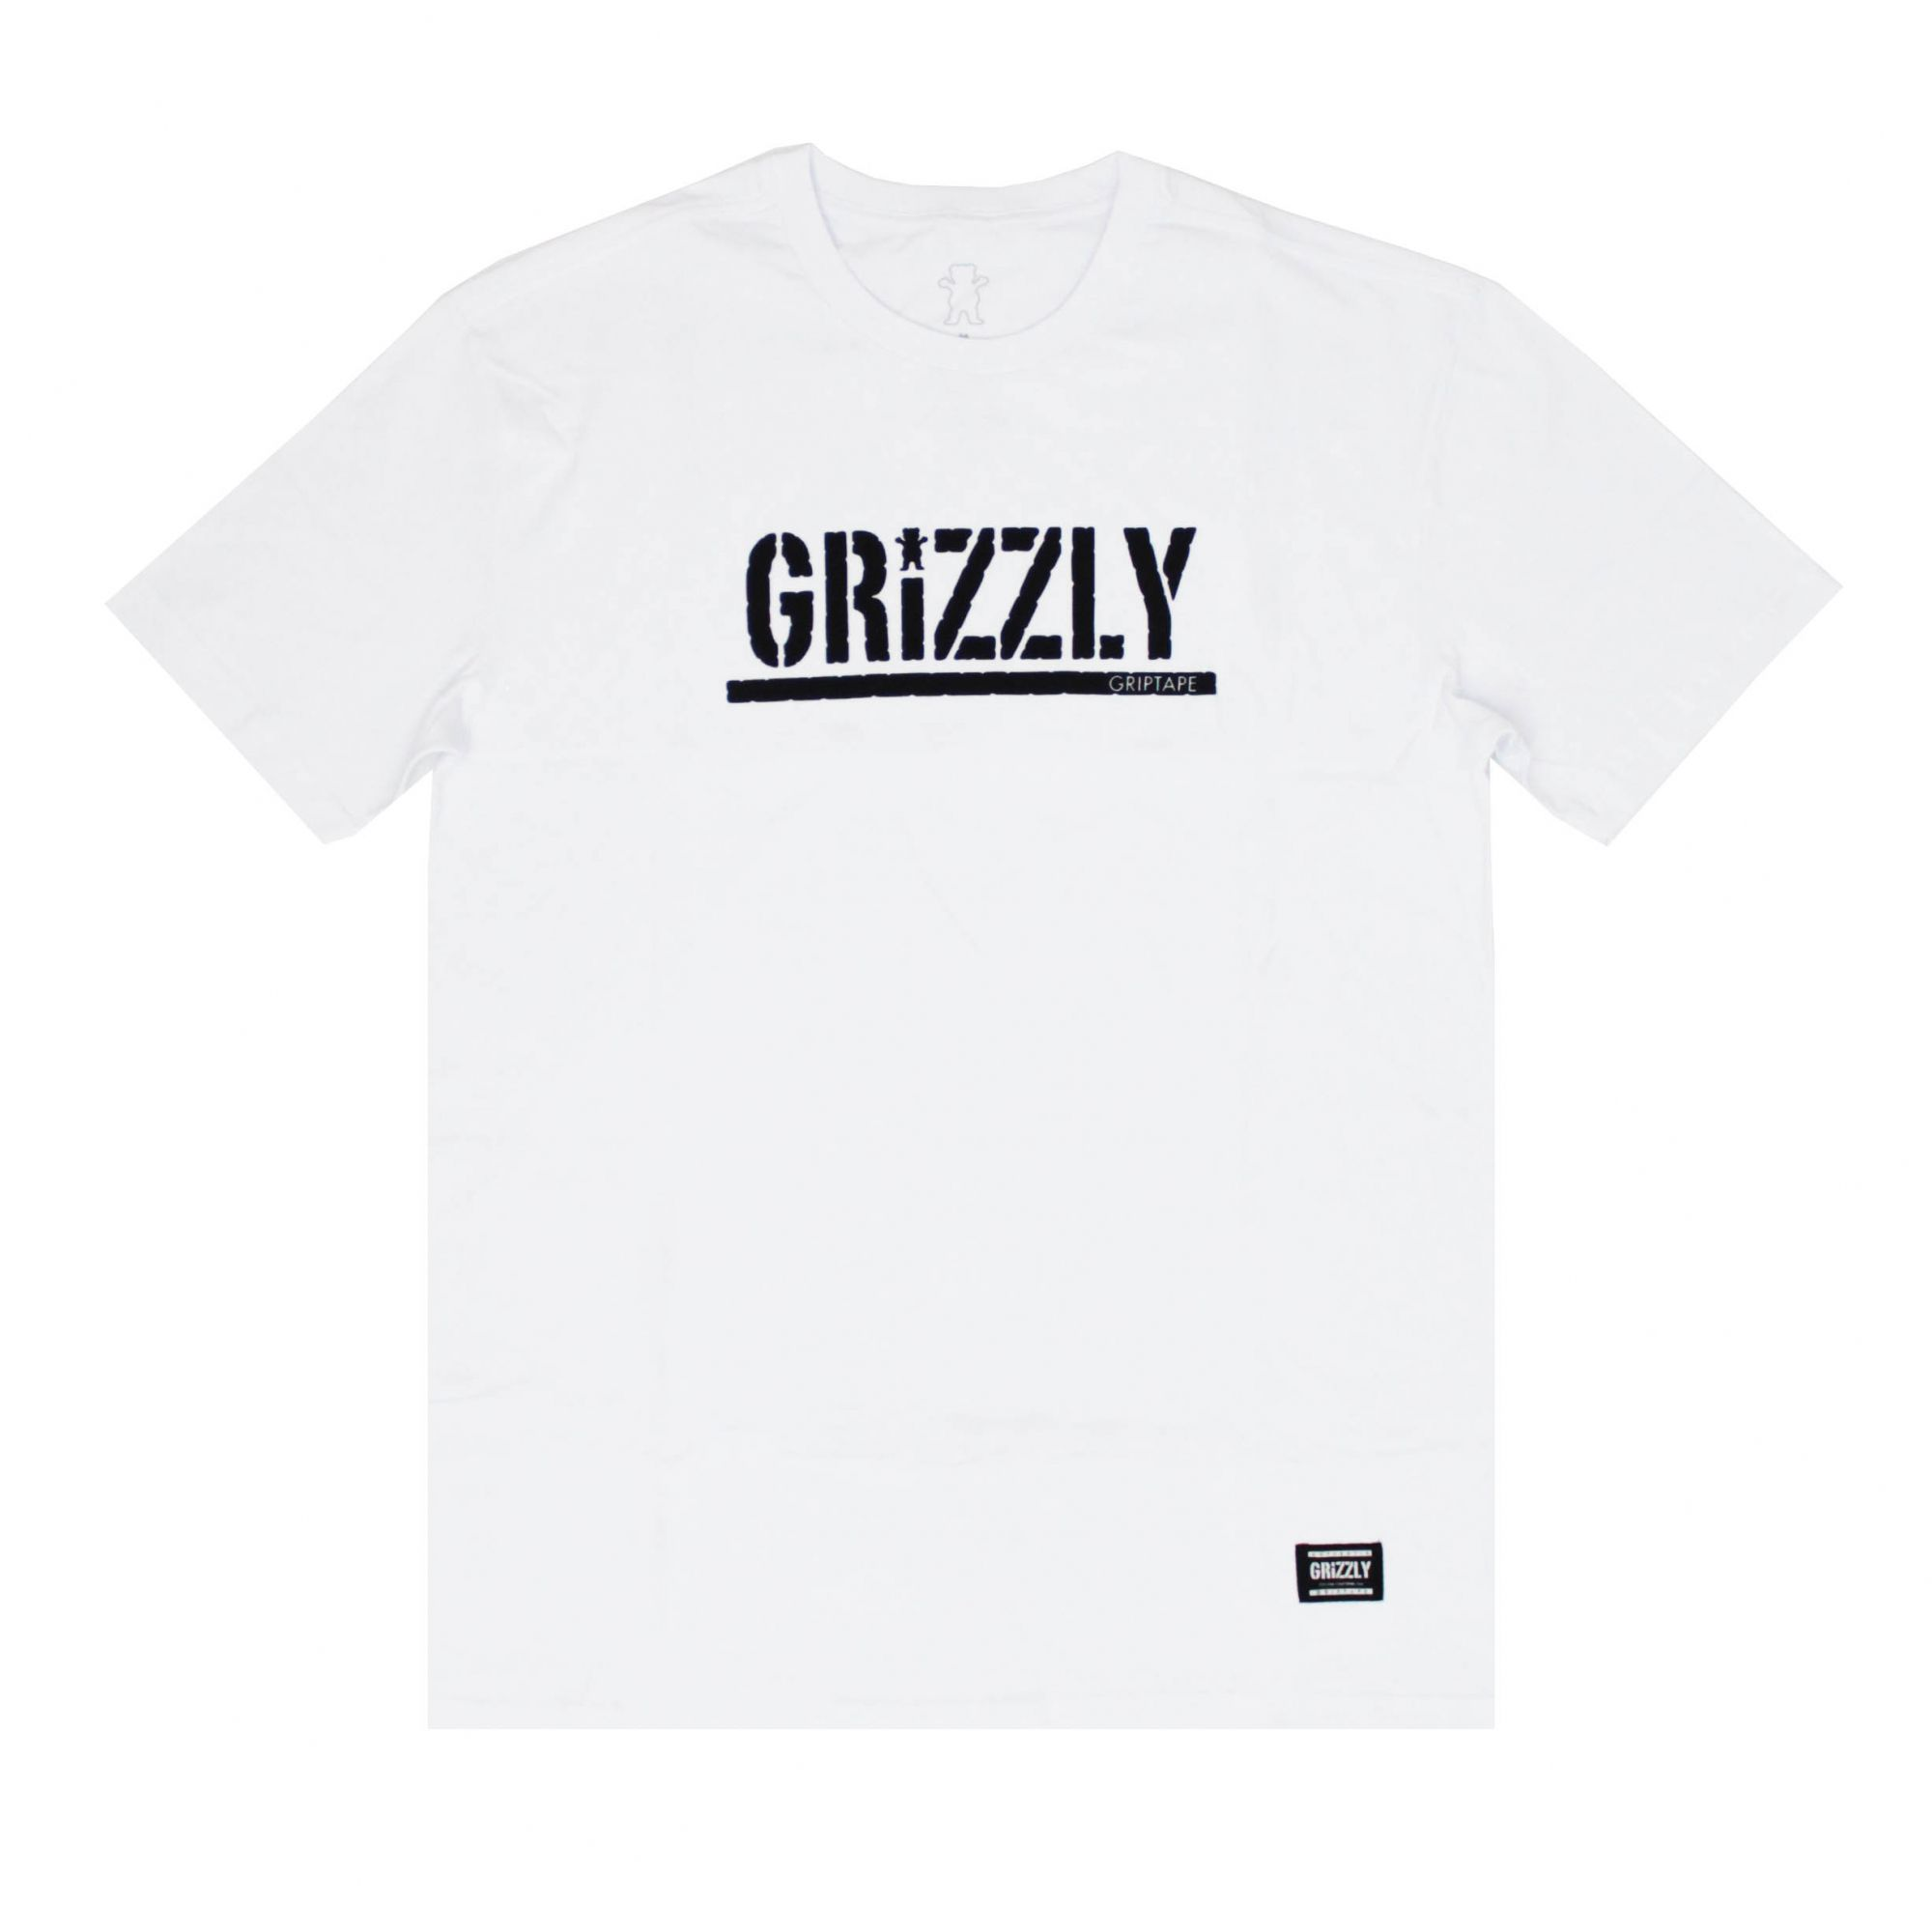 Camiseta Grizzly Classic Stamped - Branco/Preto